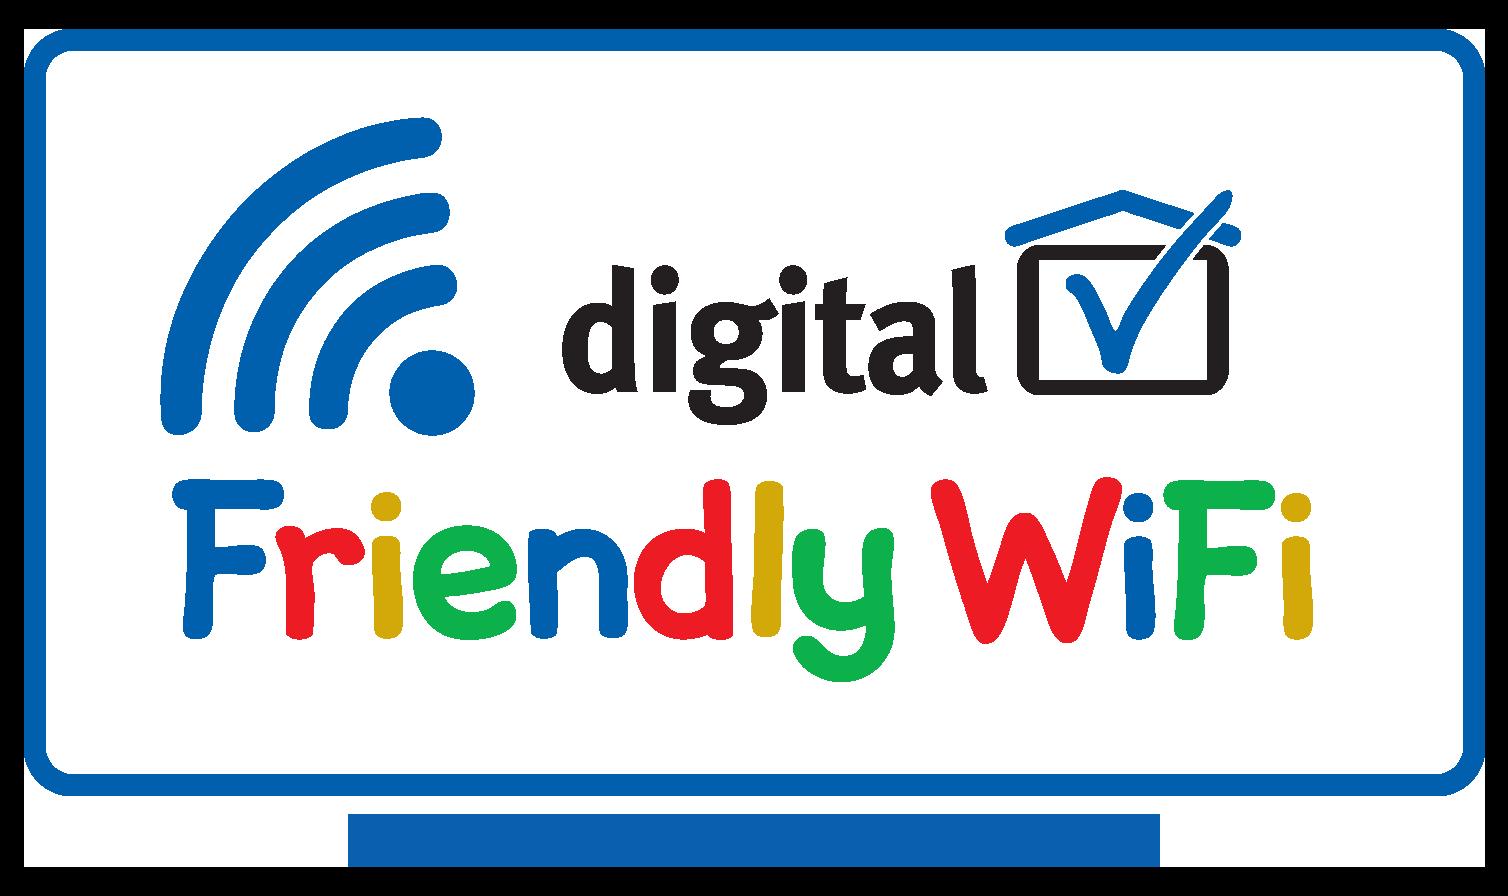 Friendly-WiFi-Logo-Splash-Page-Transparent-click-through